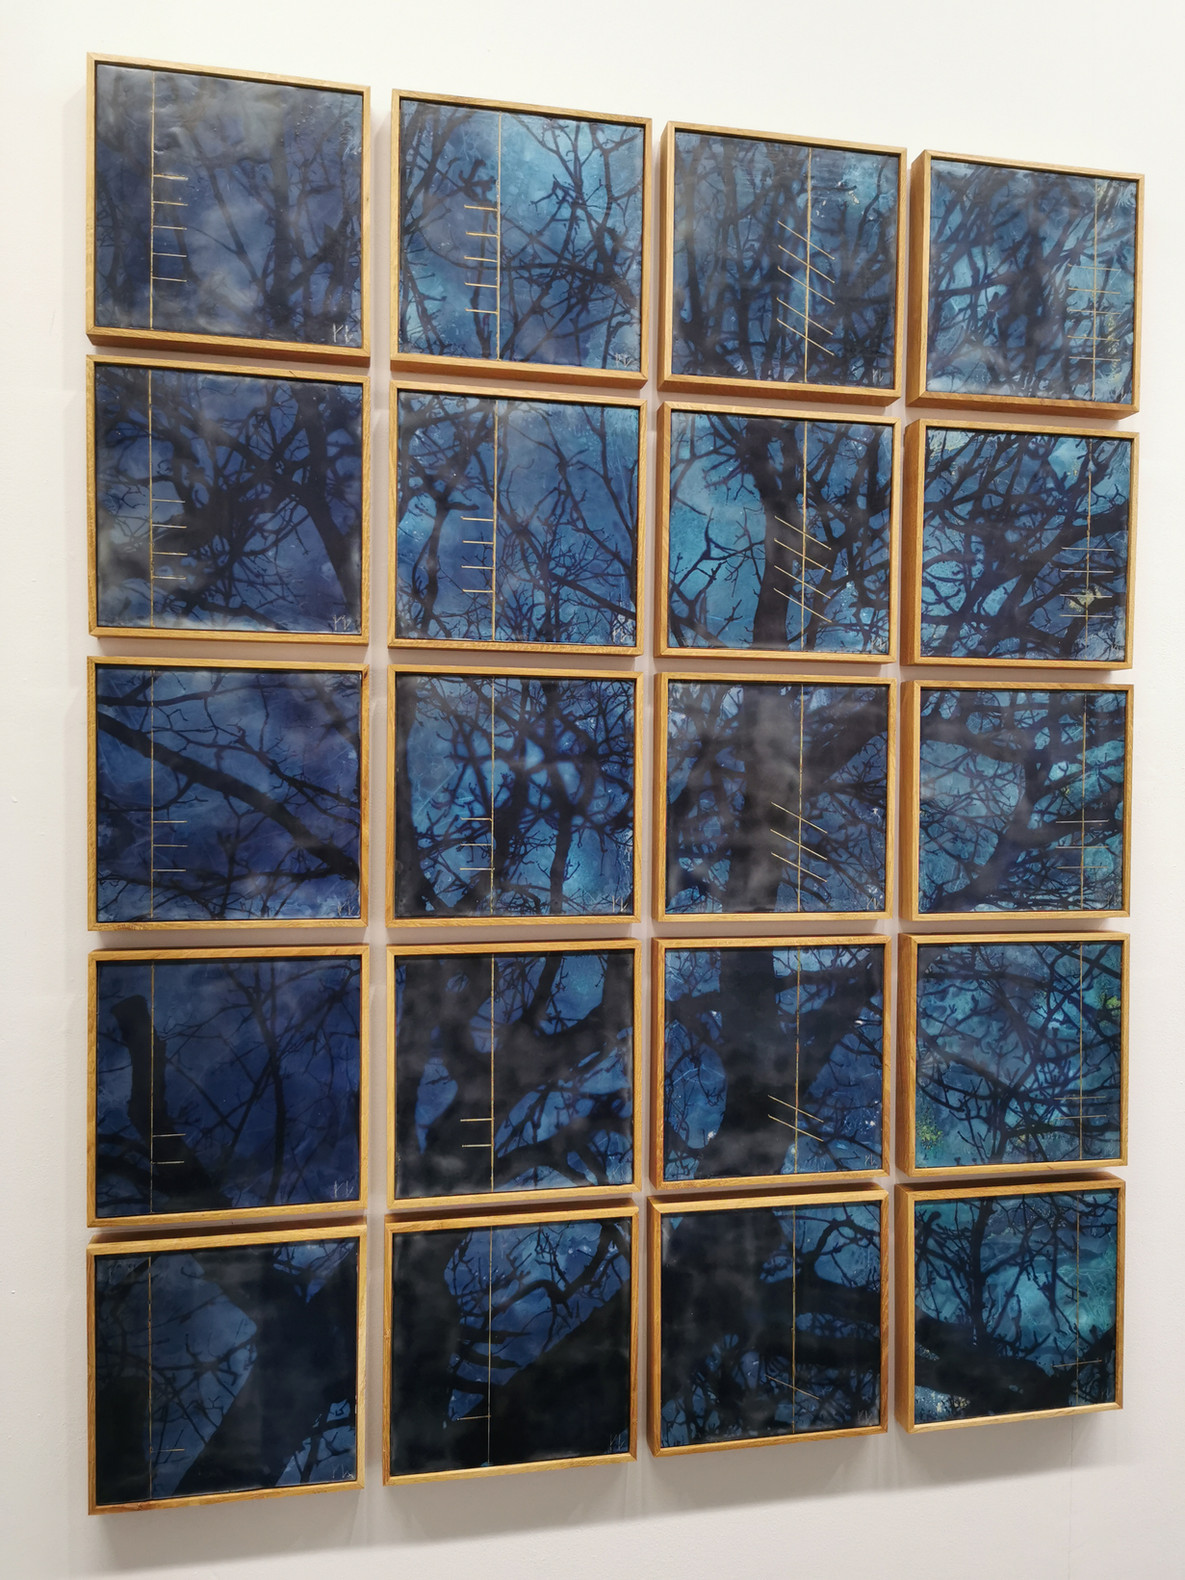 Cyanotype and encaustic wax on paper/board 20 works, 25 x 25 cm each